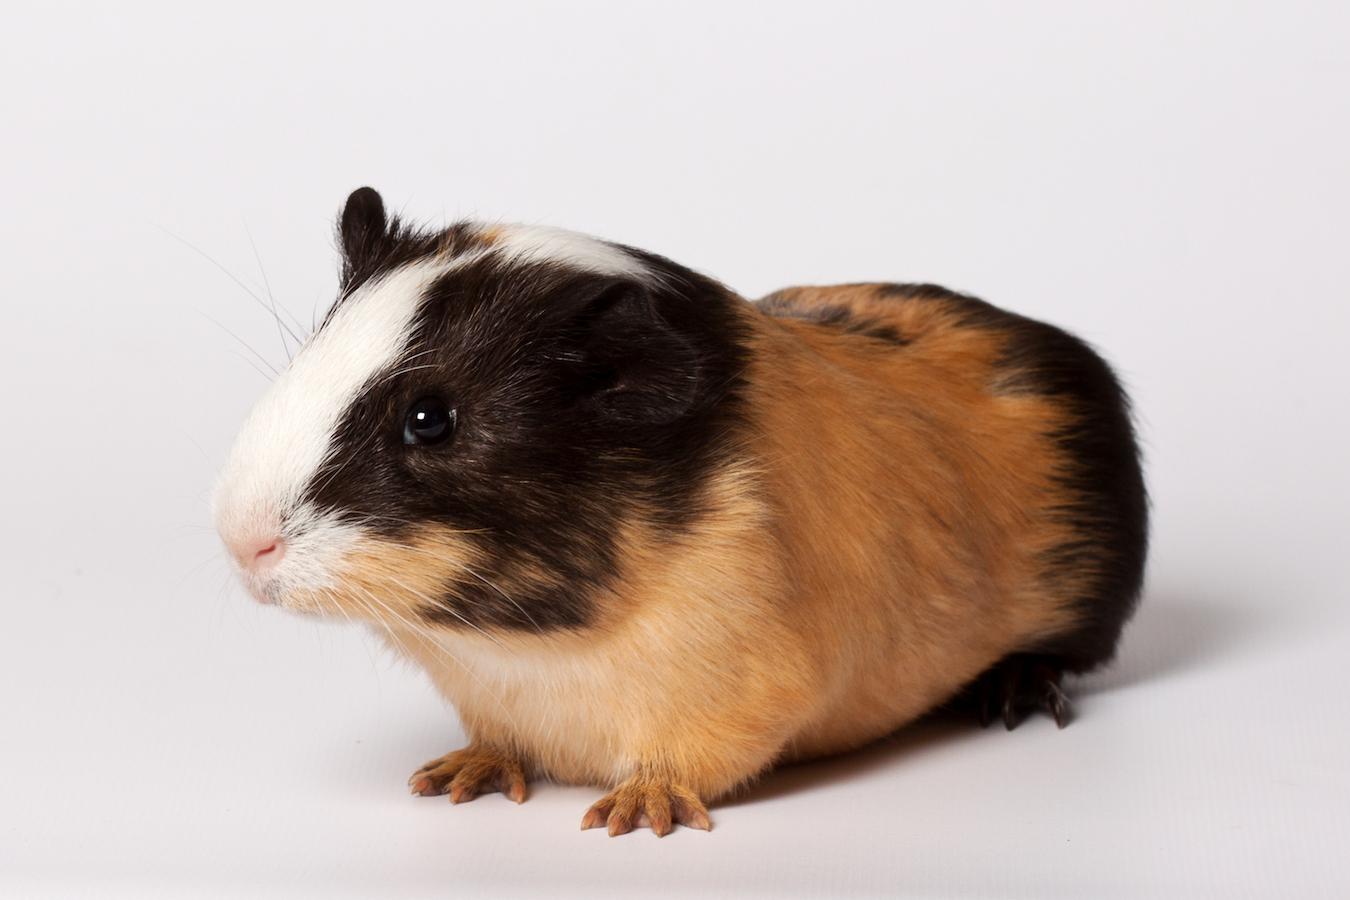 Macro portrait of small colored guinea pig